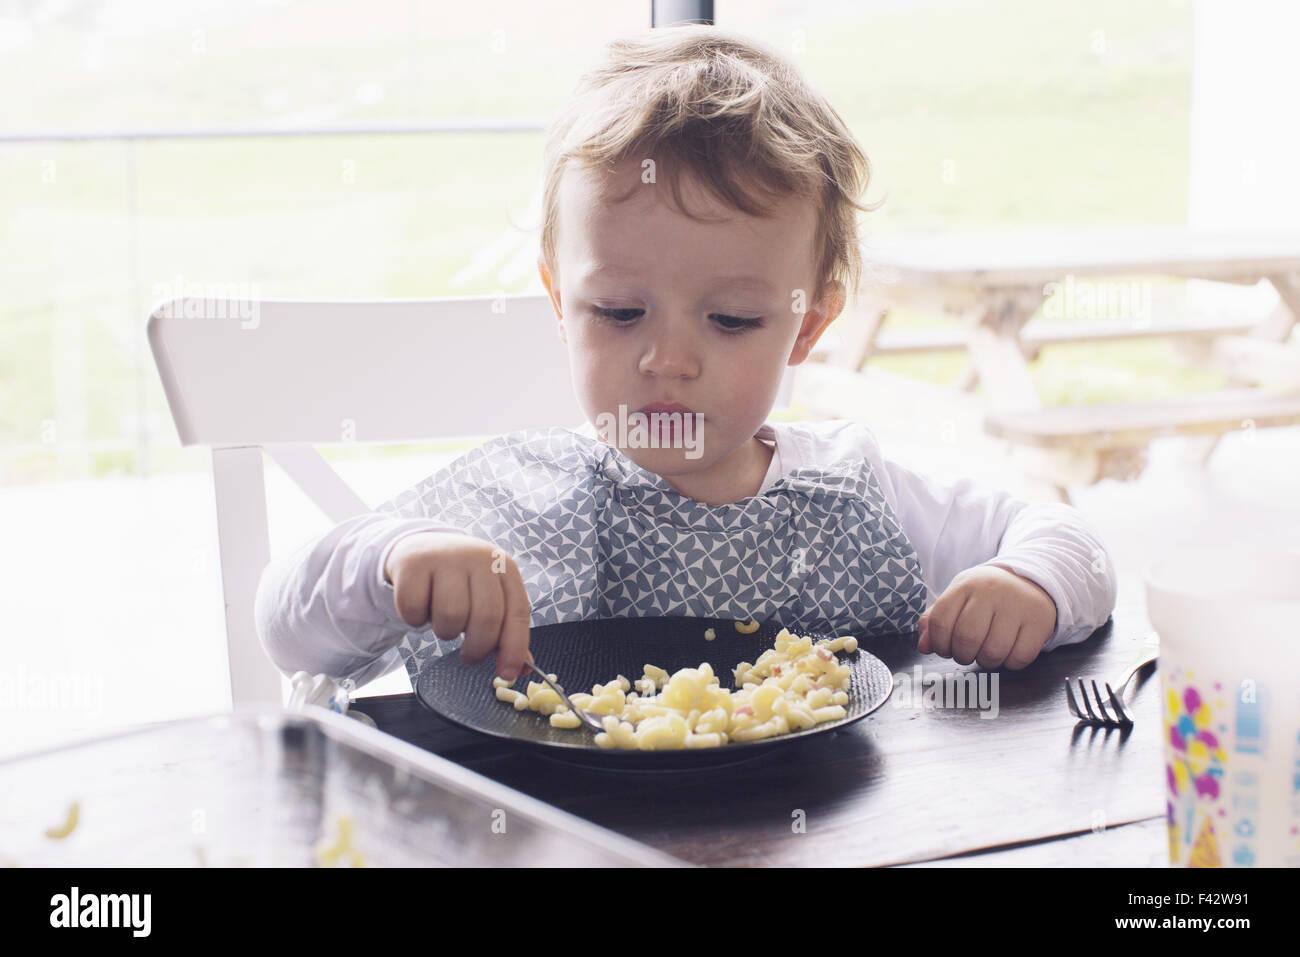 Little Boy eating macaroni Photo Stock